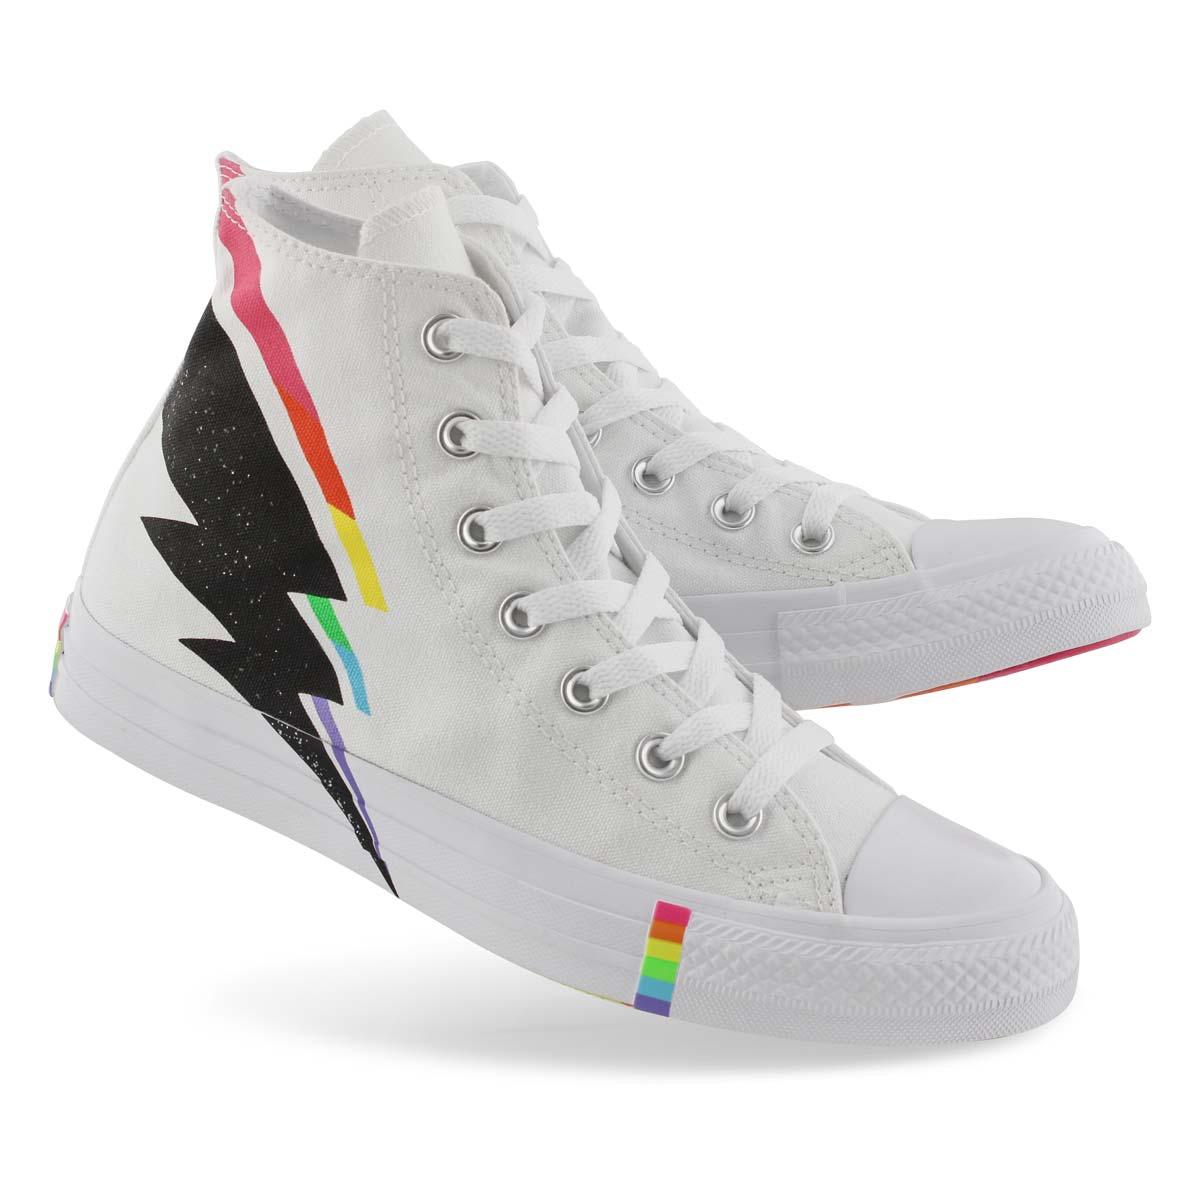 Lds CTAS Rainbow Pride Hi wht/mlt snkr